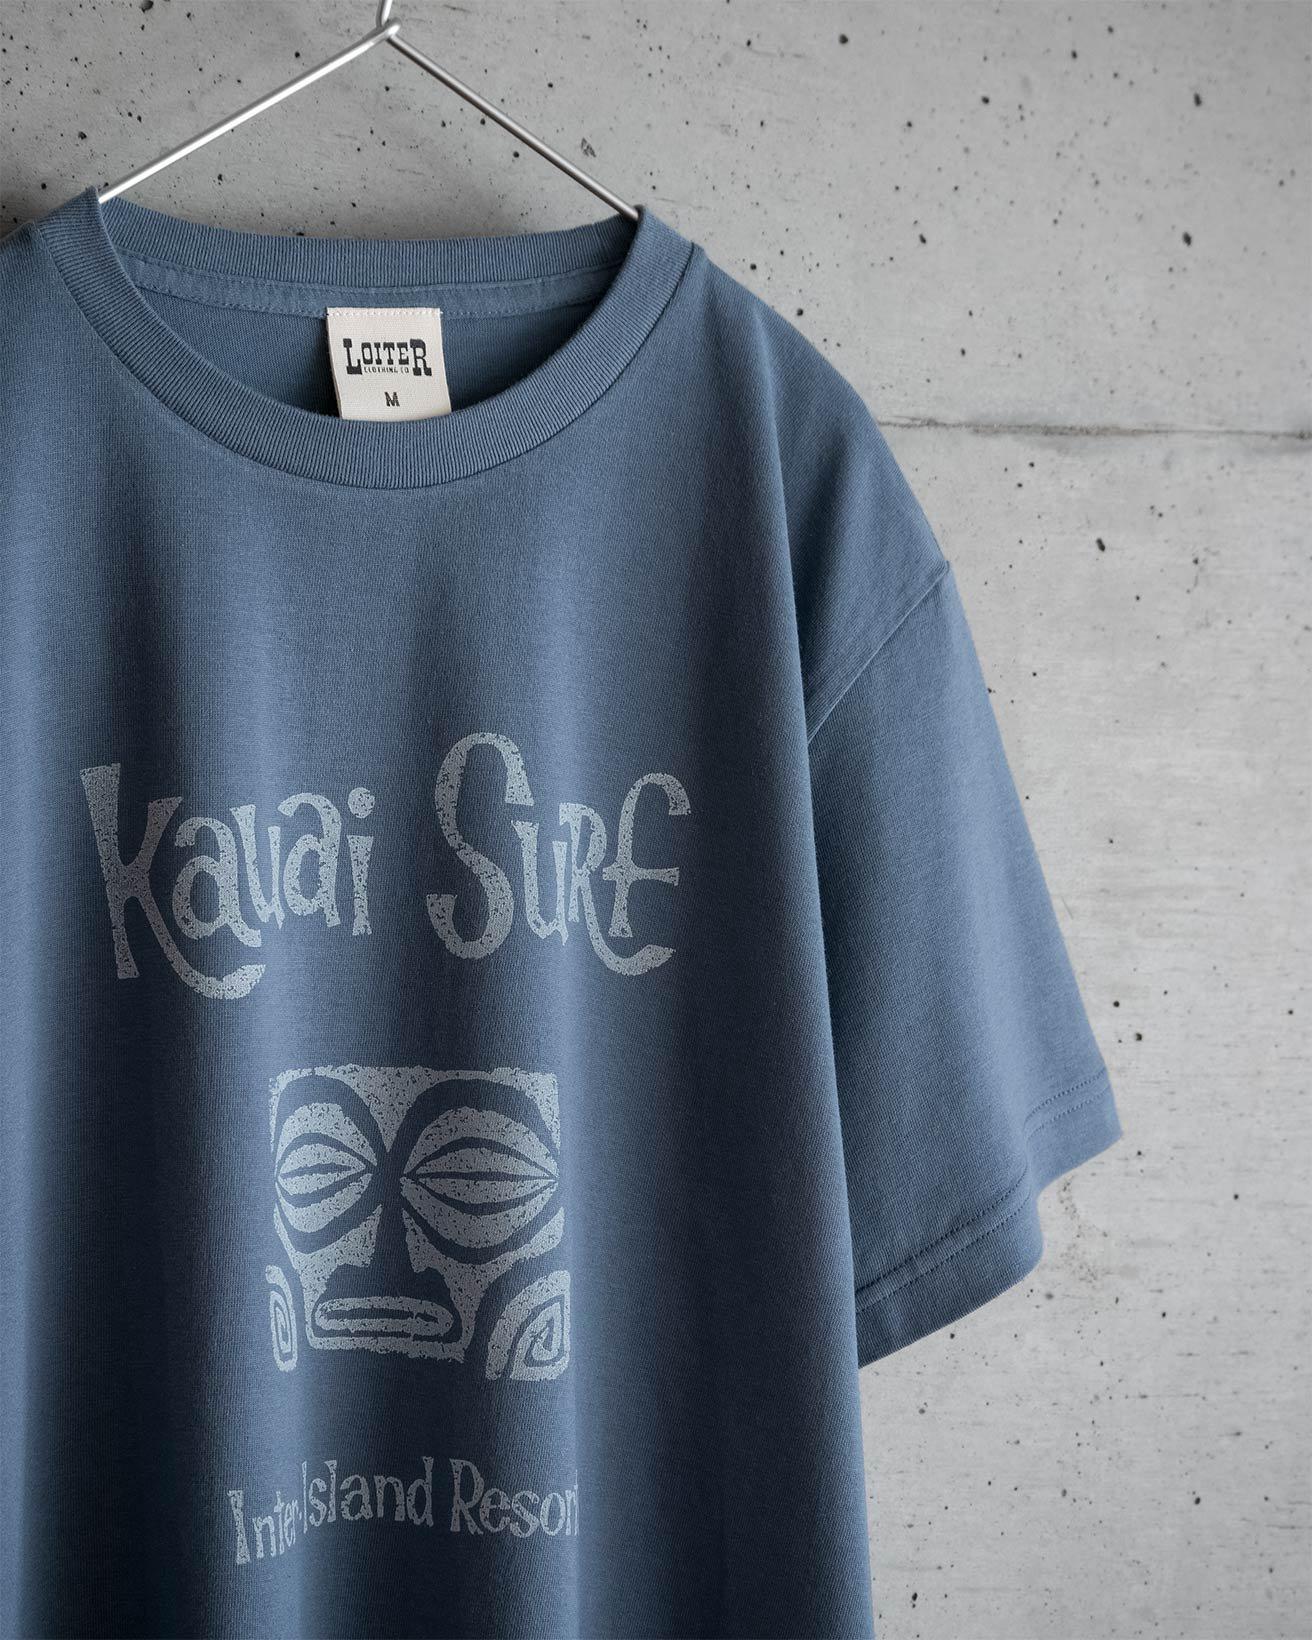 kauai surf ヴィンテージTシャツ